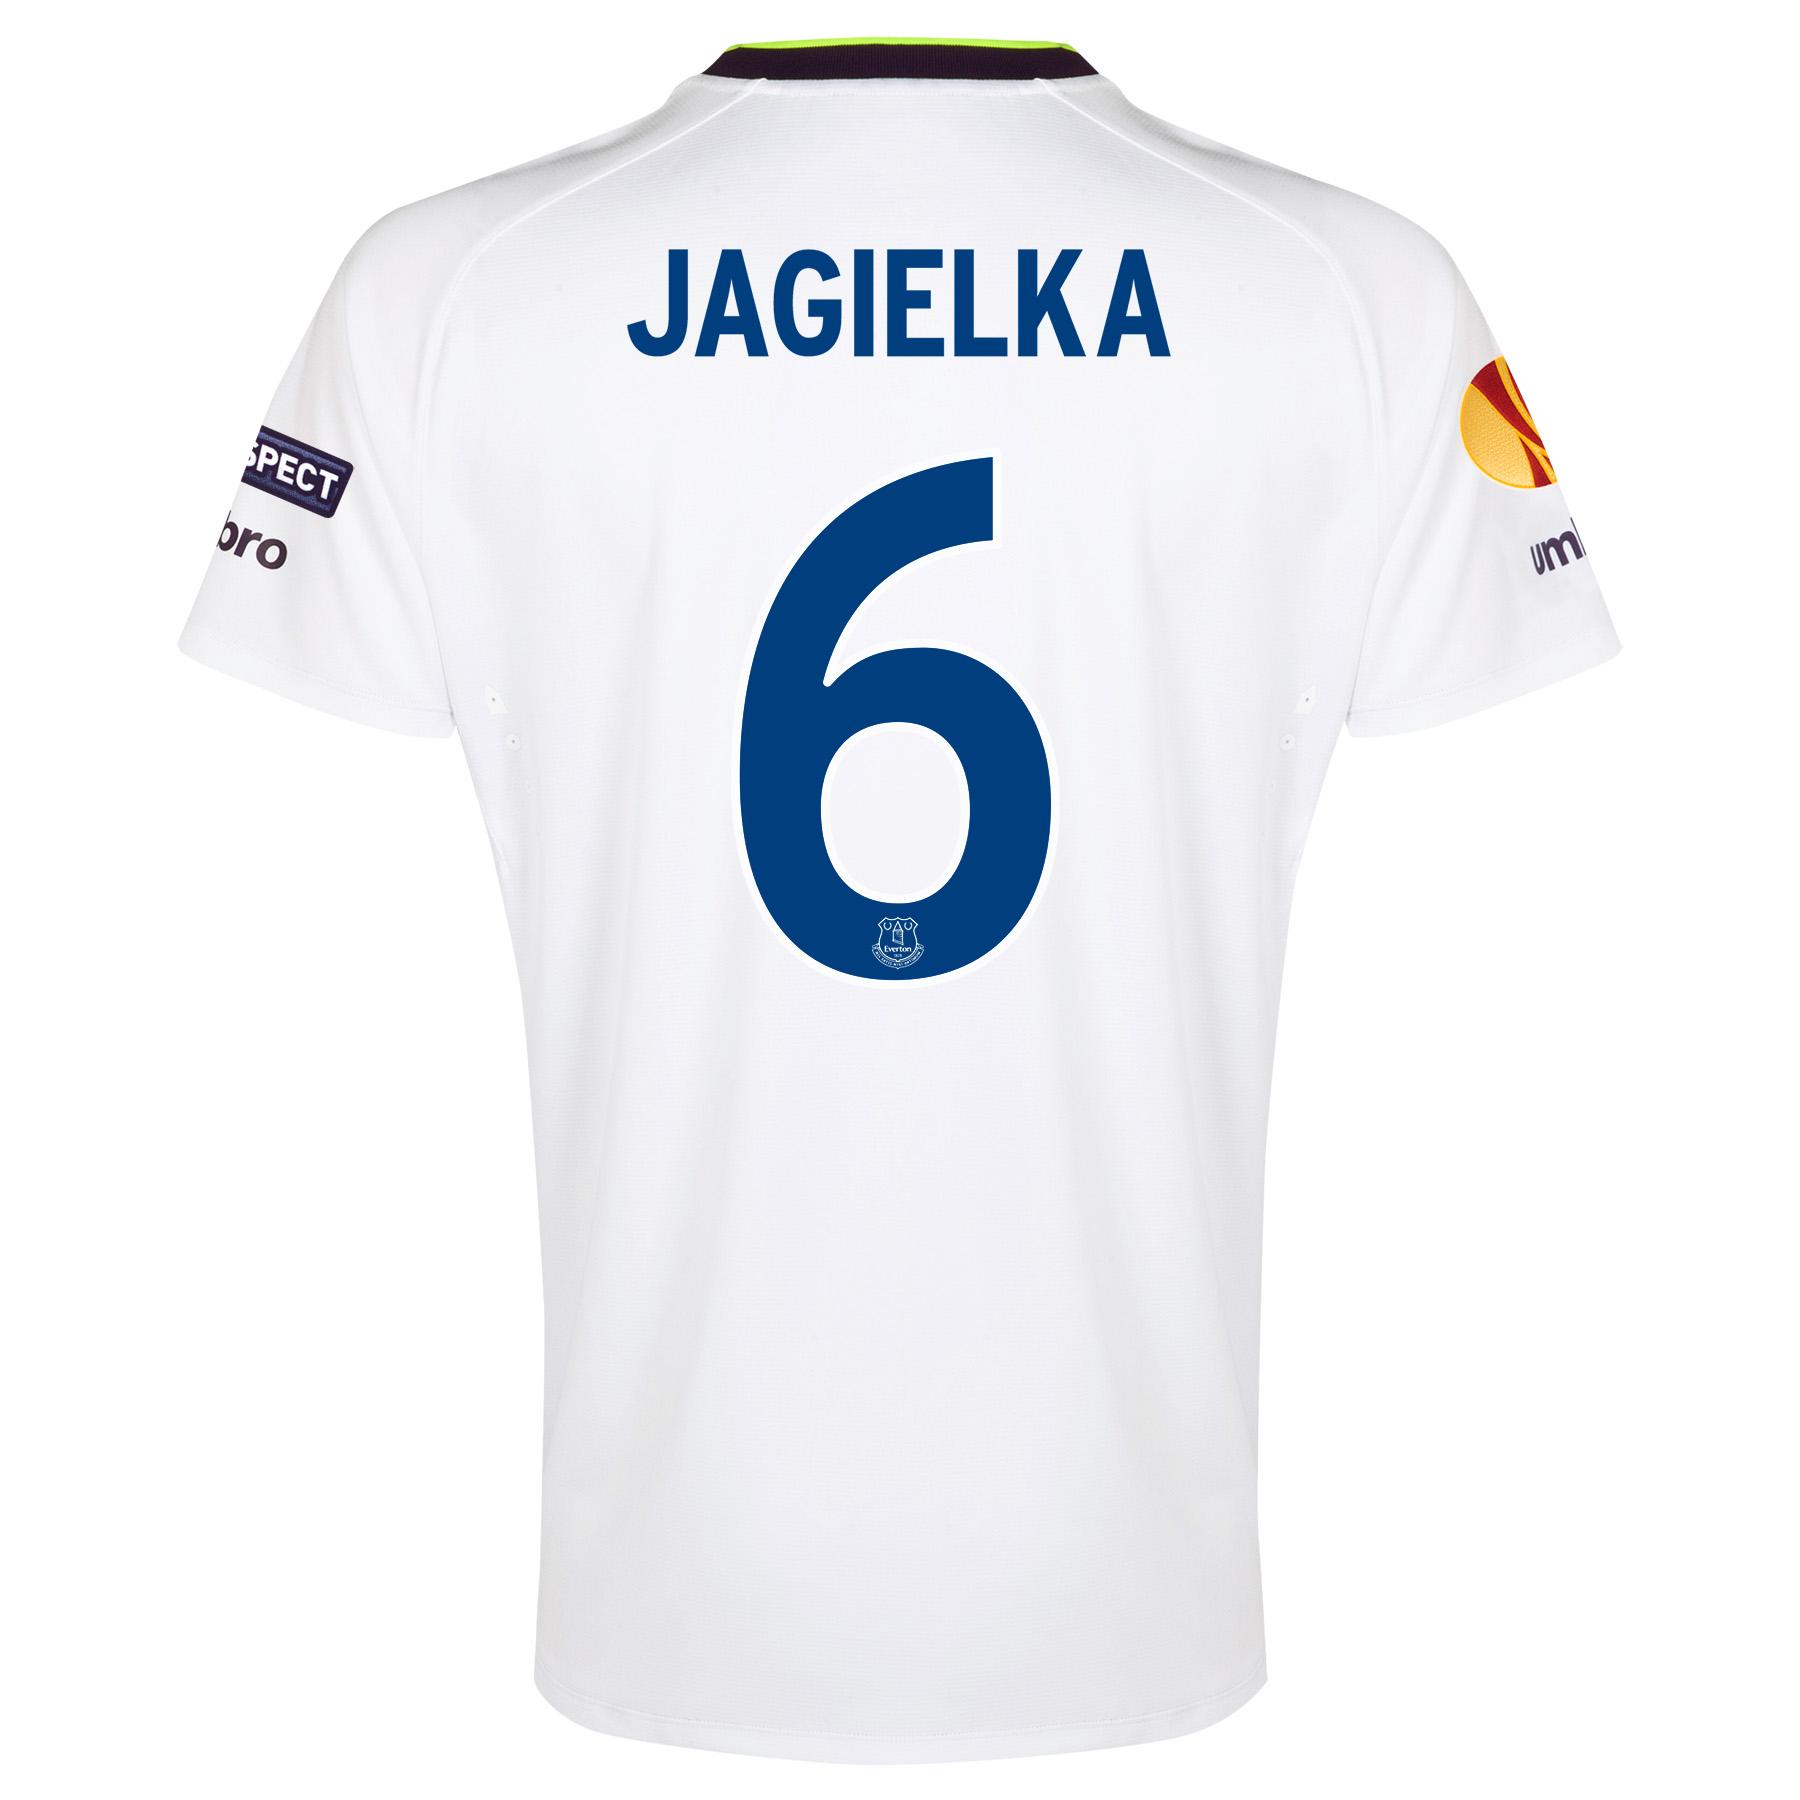 Everton UEFA Europa League 3rd Shirt 2014/15 - Junior with Jagielka 6 printing